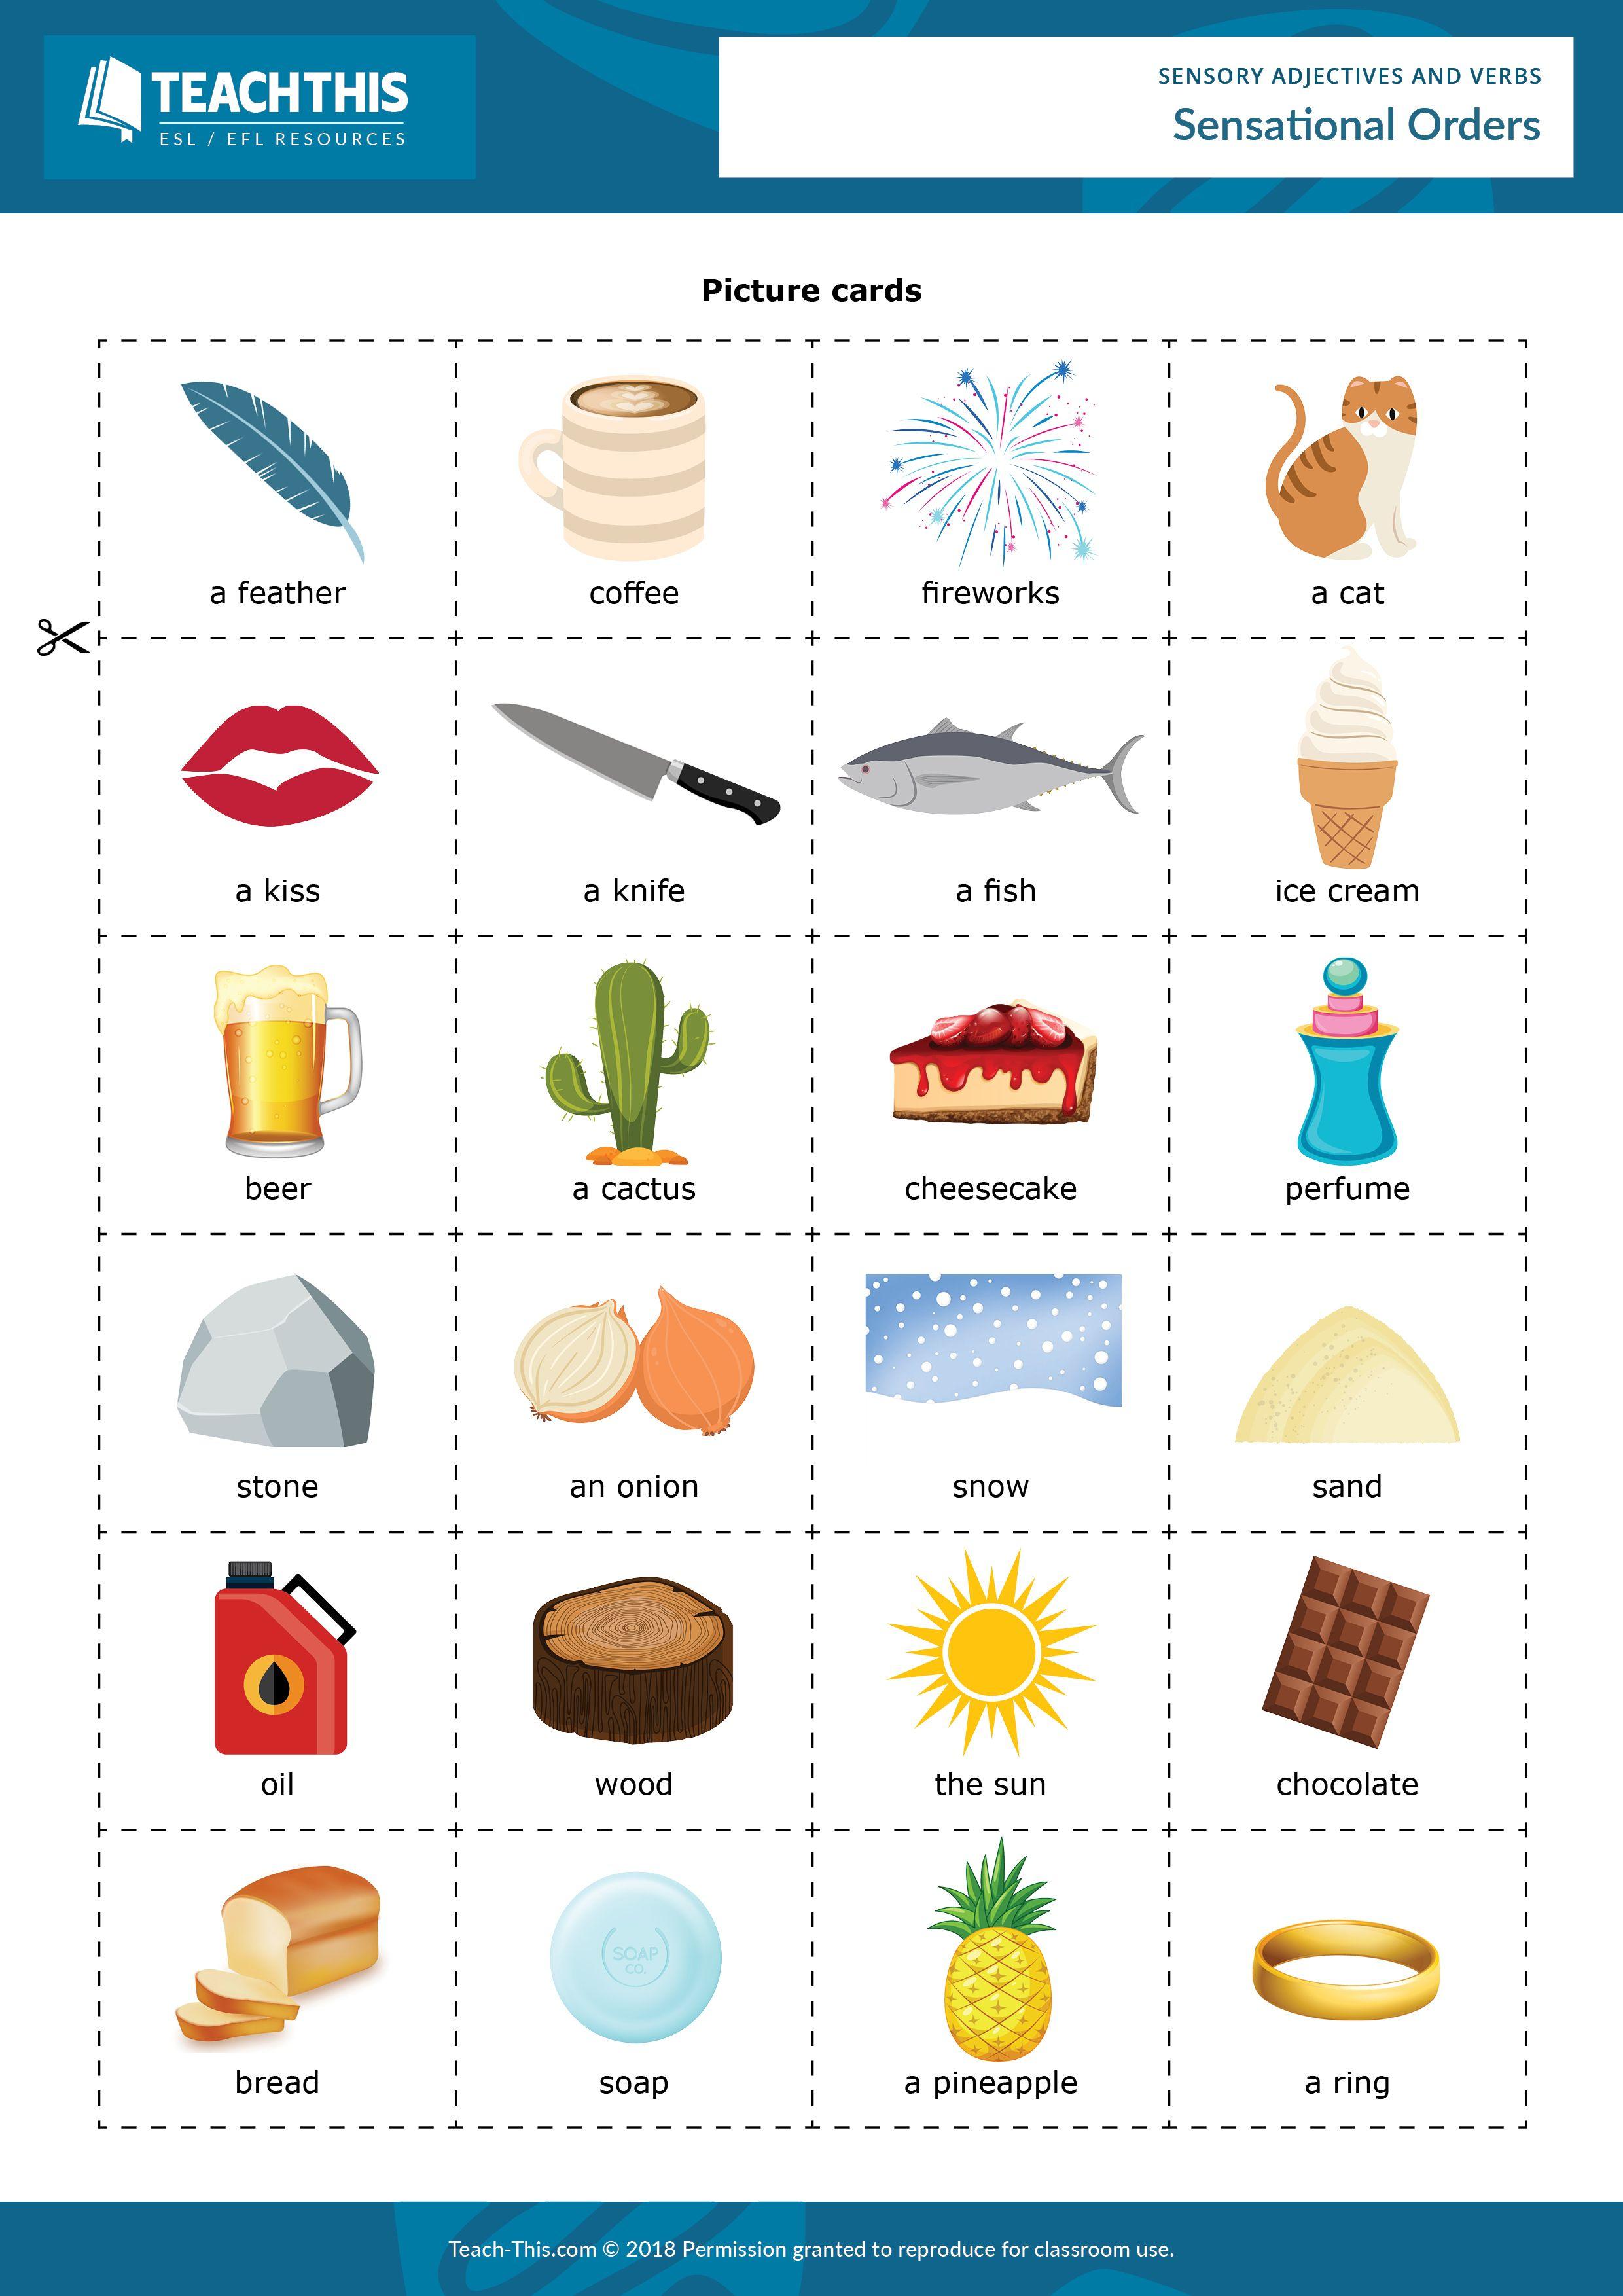 Sensory Adjectives And Verbs